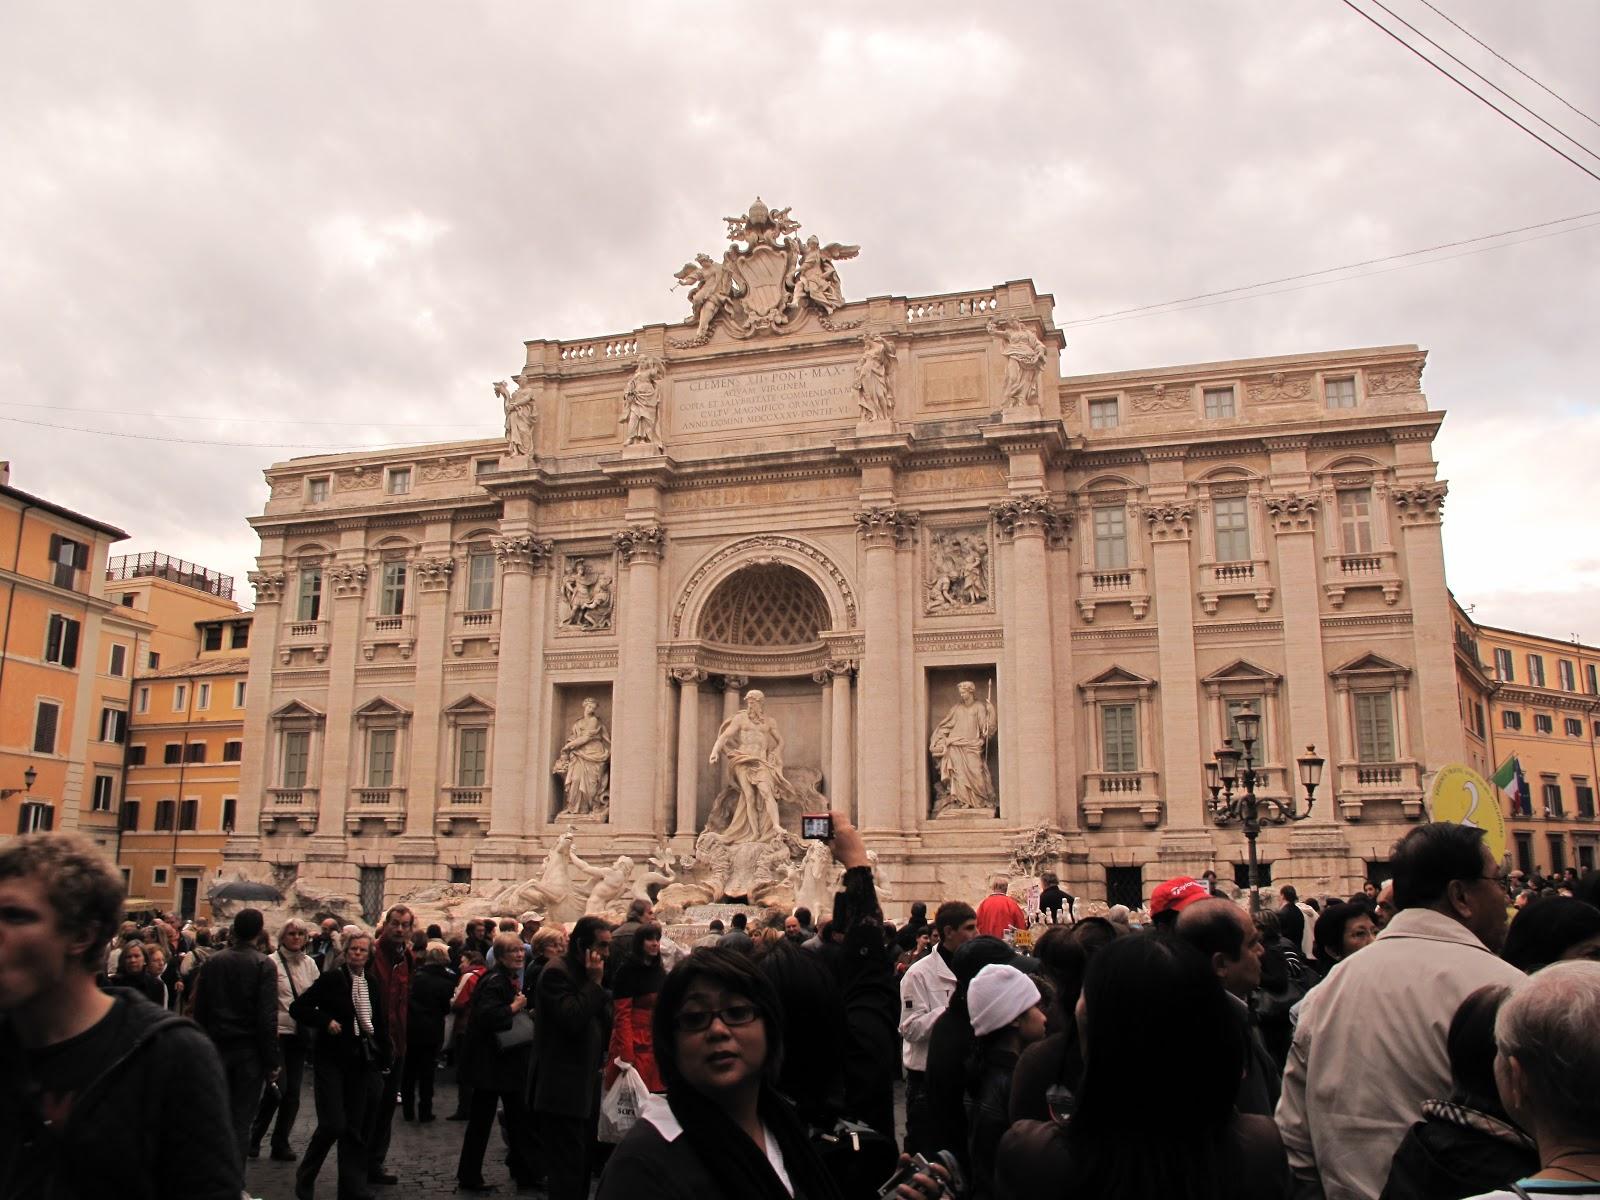 trevi fountain rome italy wallpapers - Trevi Fountain HD desktop wallpaper High Definition